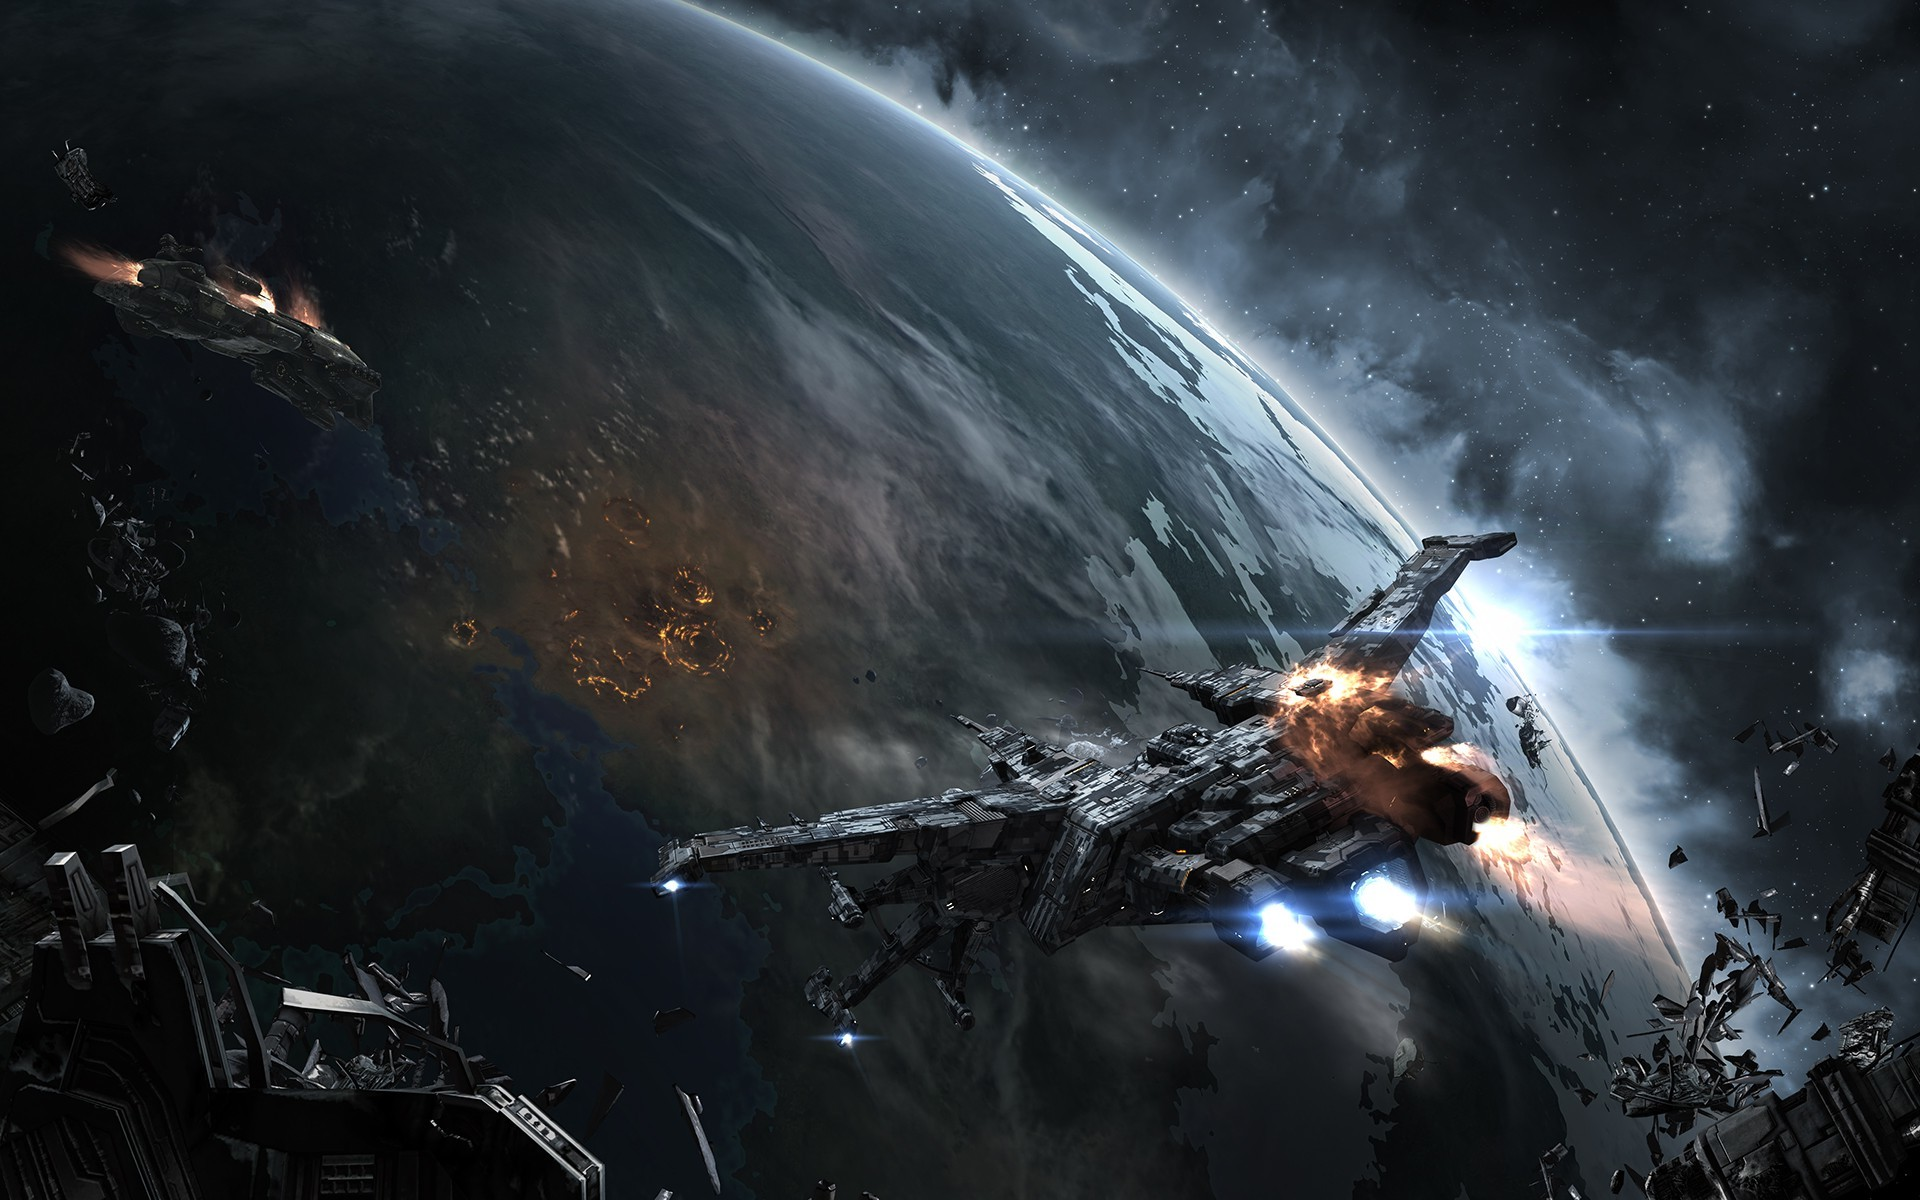 space, Spaceship, EVE Online, Space Battle, Caldari Wallpapers HD / Desktop  and Mobile Backgrounds